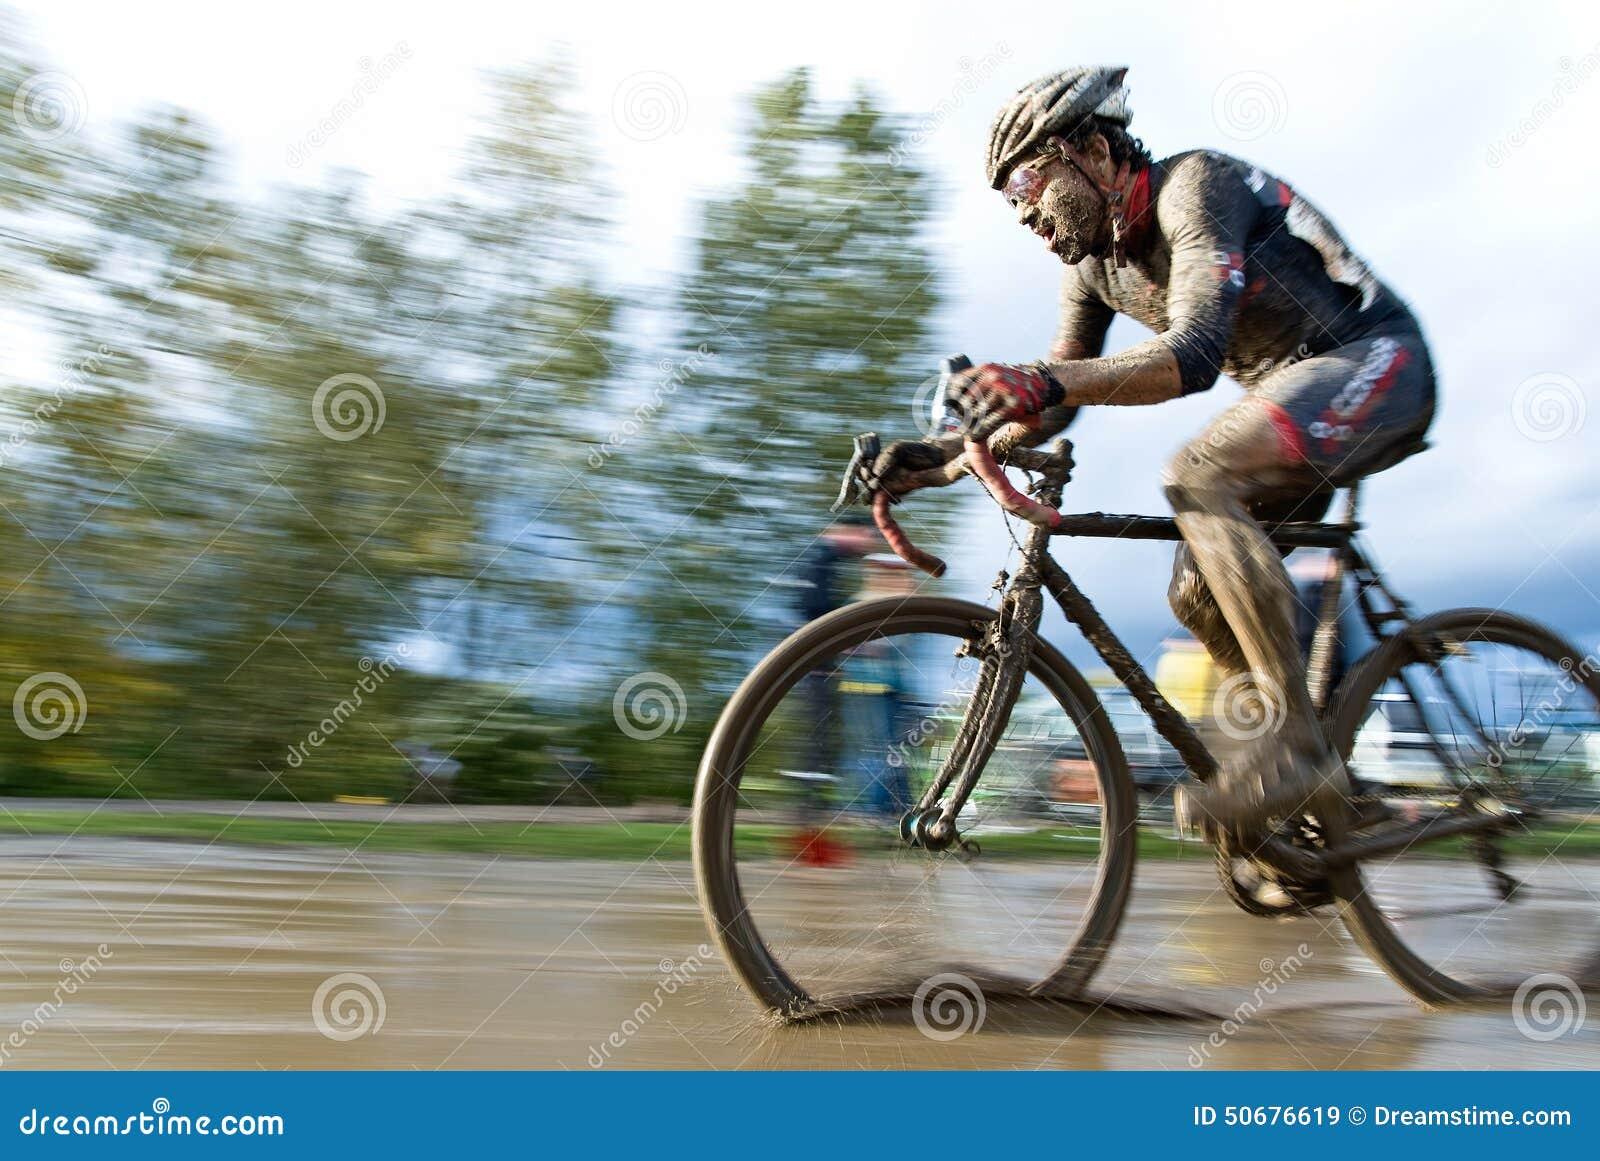 Download 男性骑自行车者骑马通过泥浆坑 库存图片. 图片 包括有 骑自行车者, 活动家, 有效地, 行动, 确定, 骑马 - 50676619